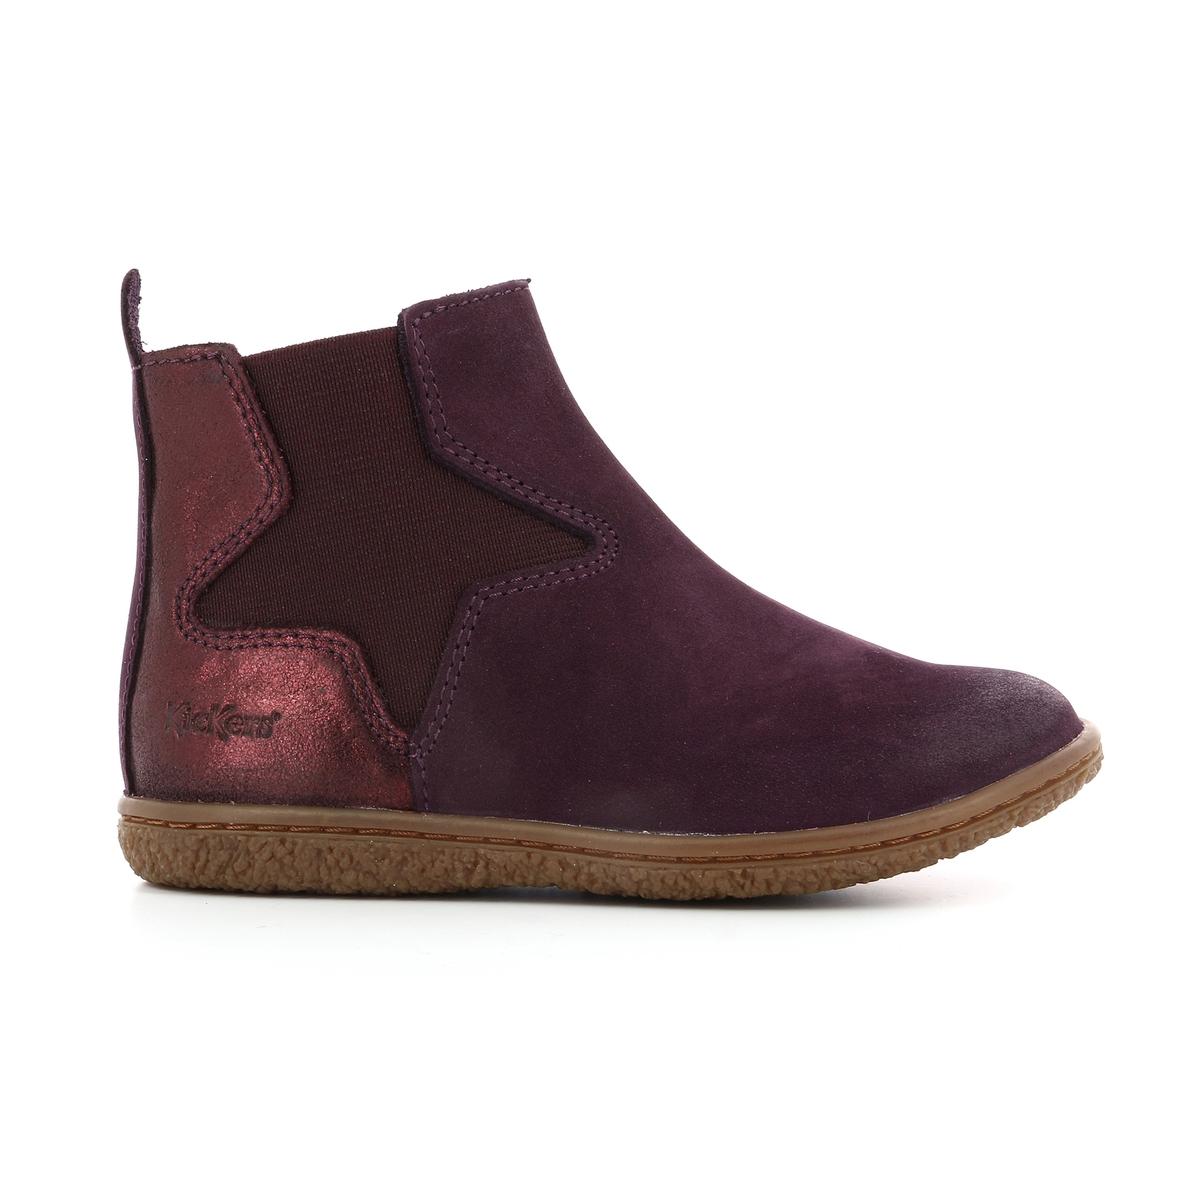 Boots in pelle Vermillon